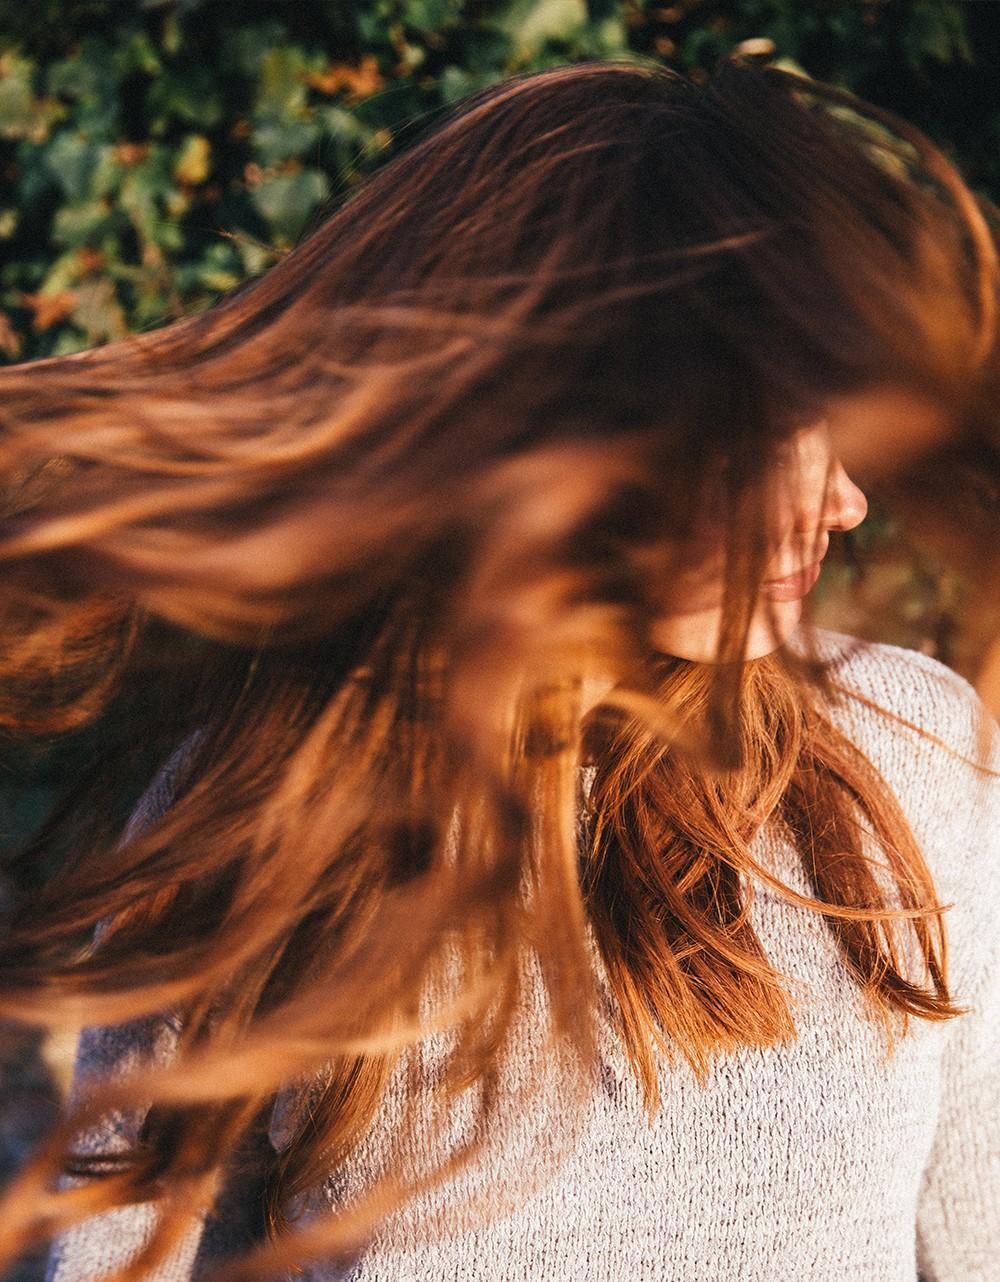 Spa del cabello x4 sesiones de Vegetalement